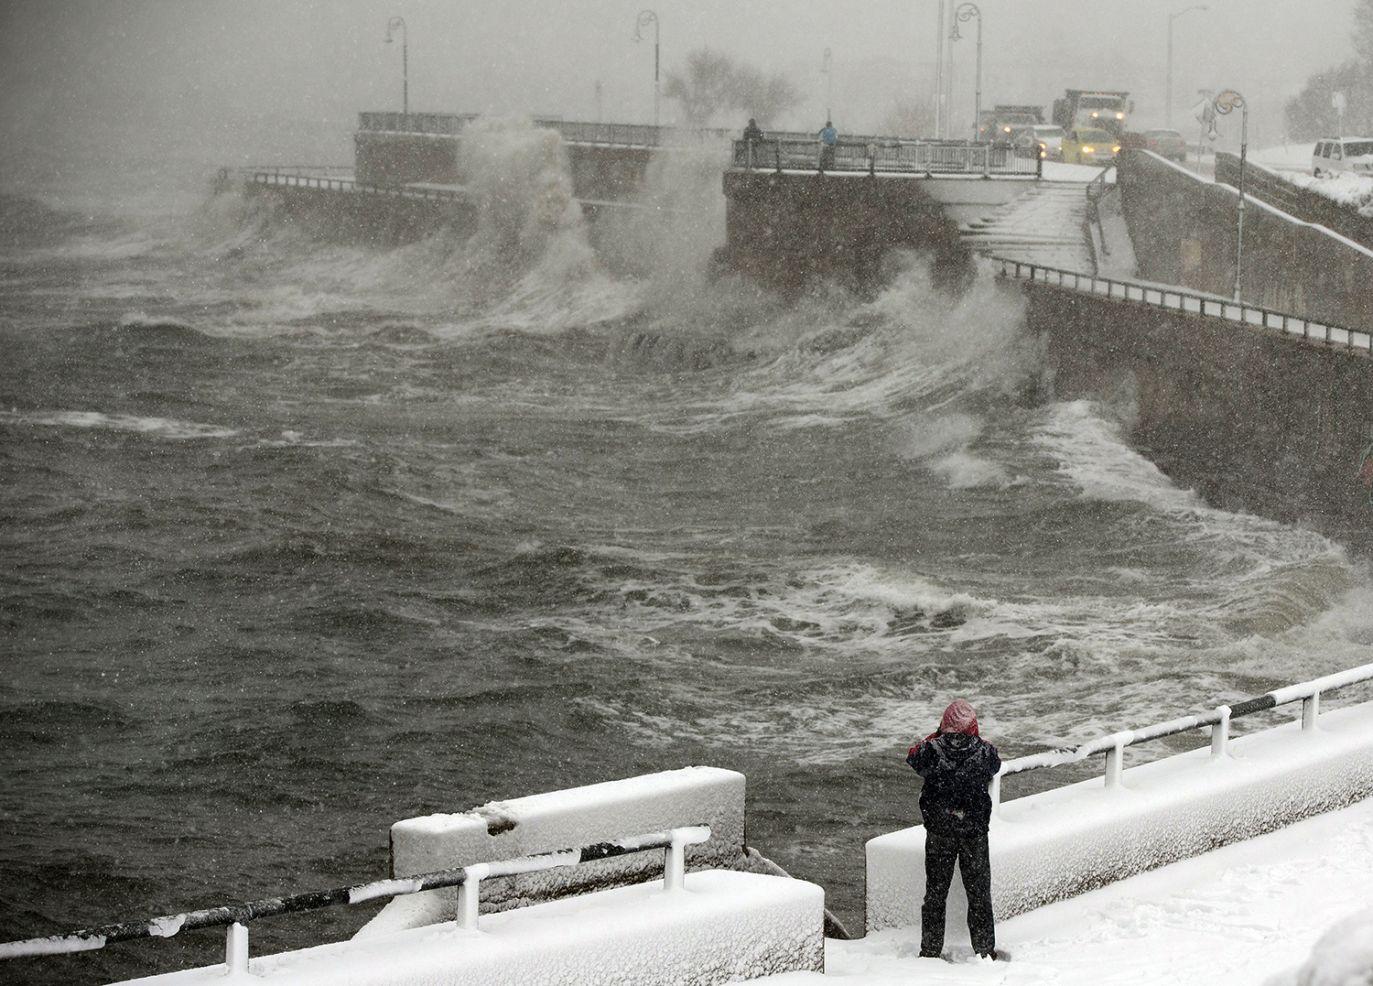 (fot. PAP/EPA/CJ GUNTHER)